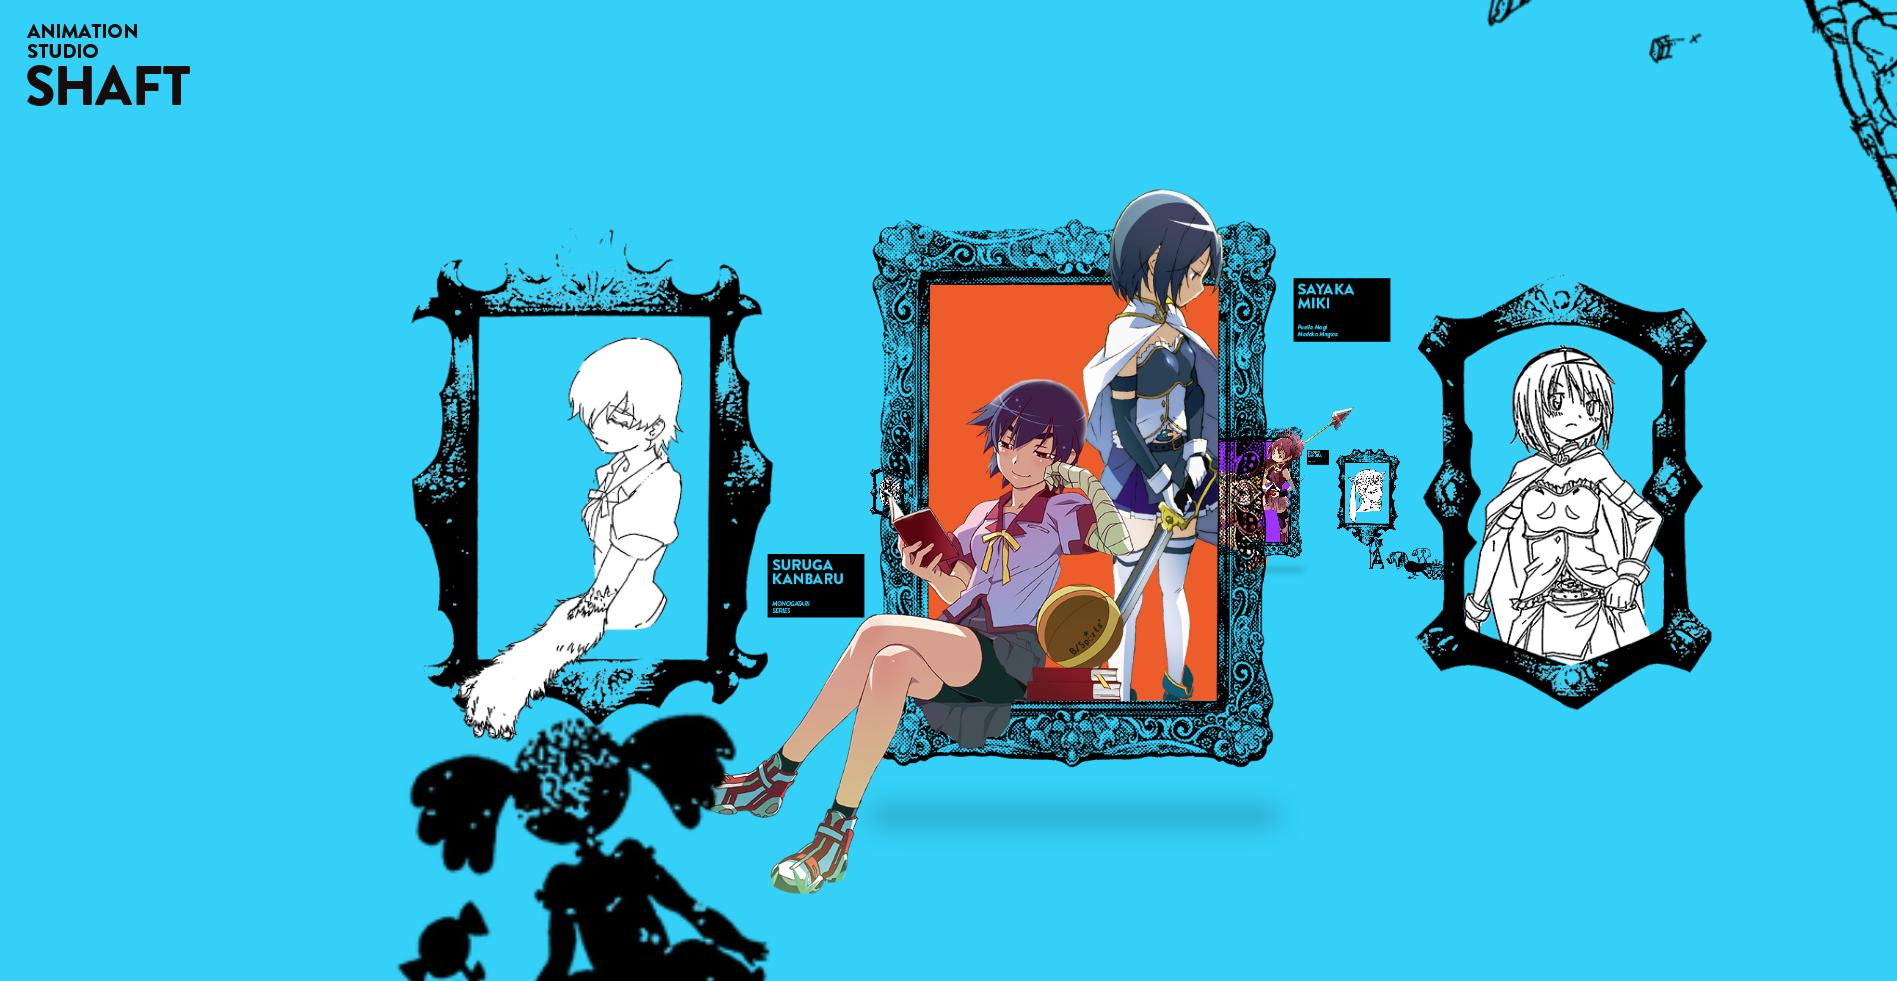 SHAFT Launches Madogatari Exhibit to Celebrate 40th Anniversary Monogatari Madoka Magica 2